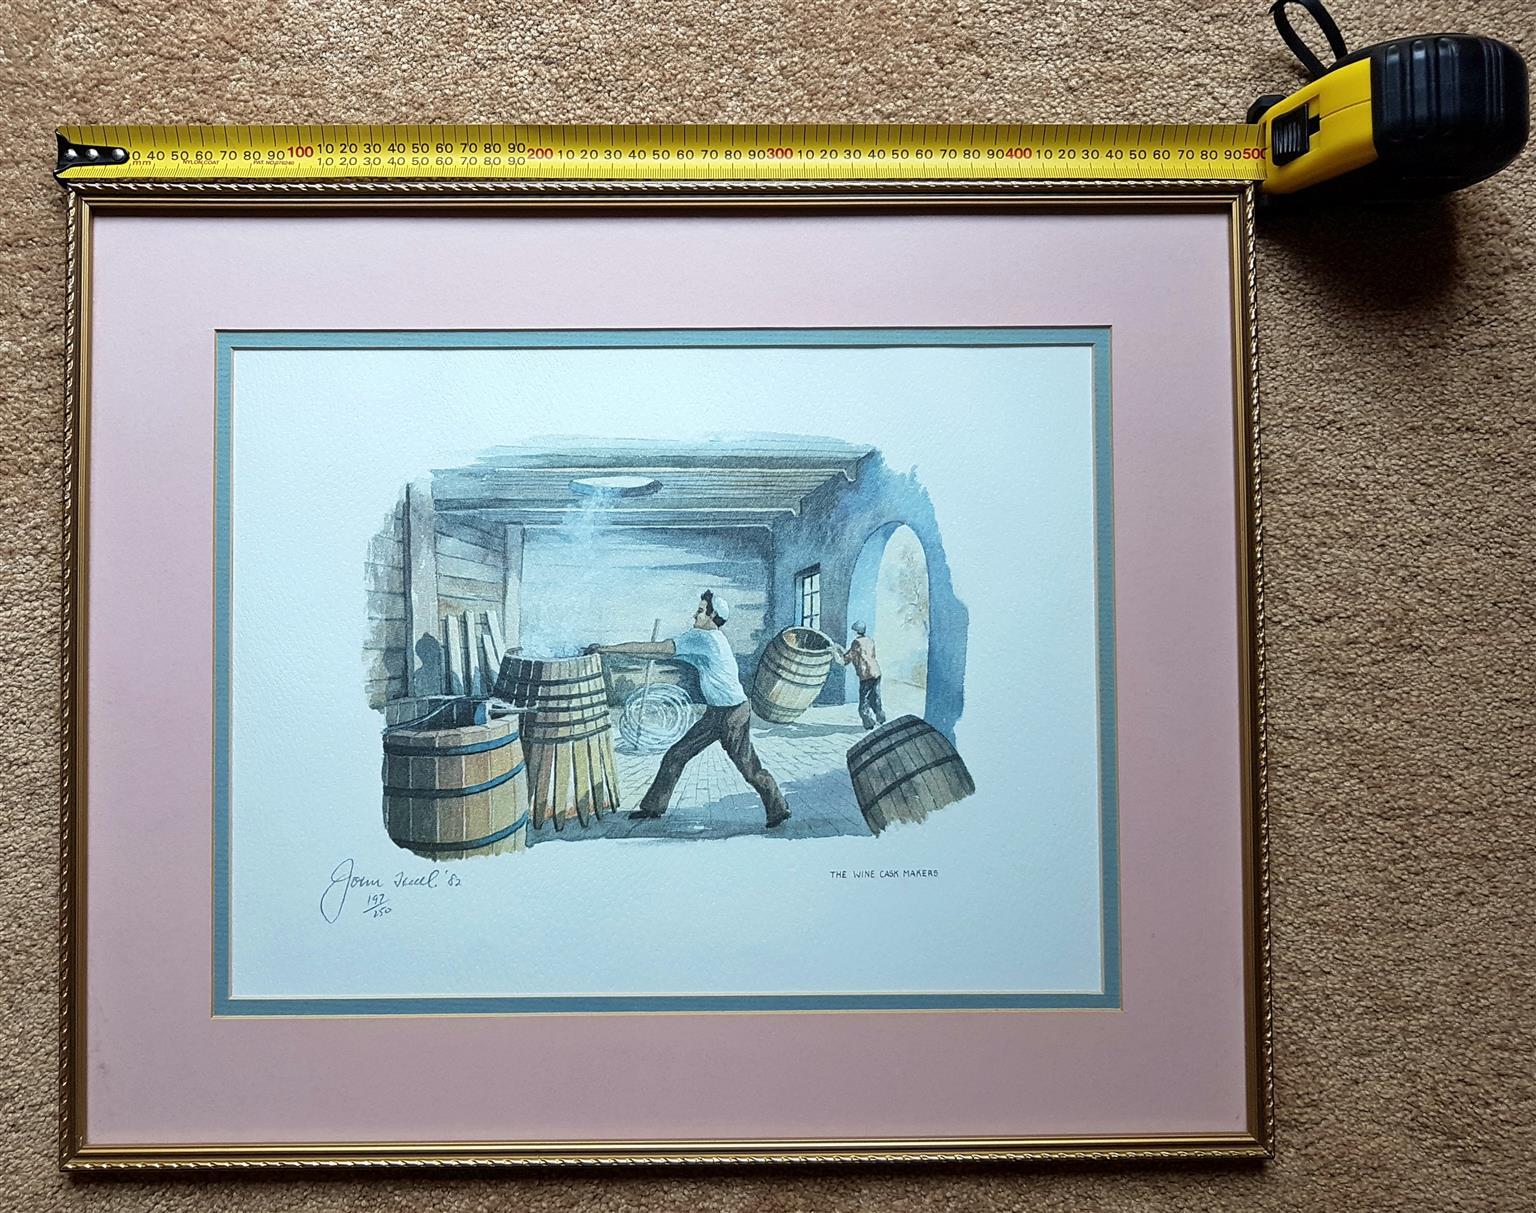 John Hall framed limited edition prints